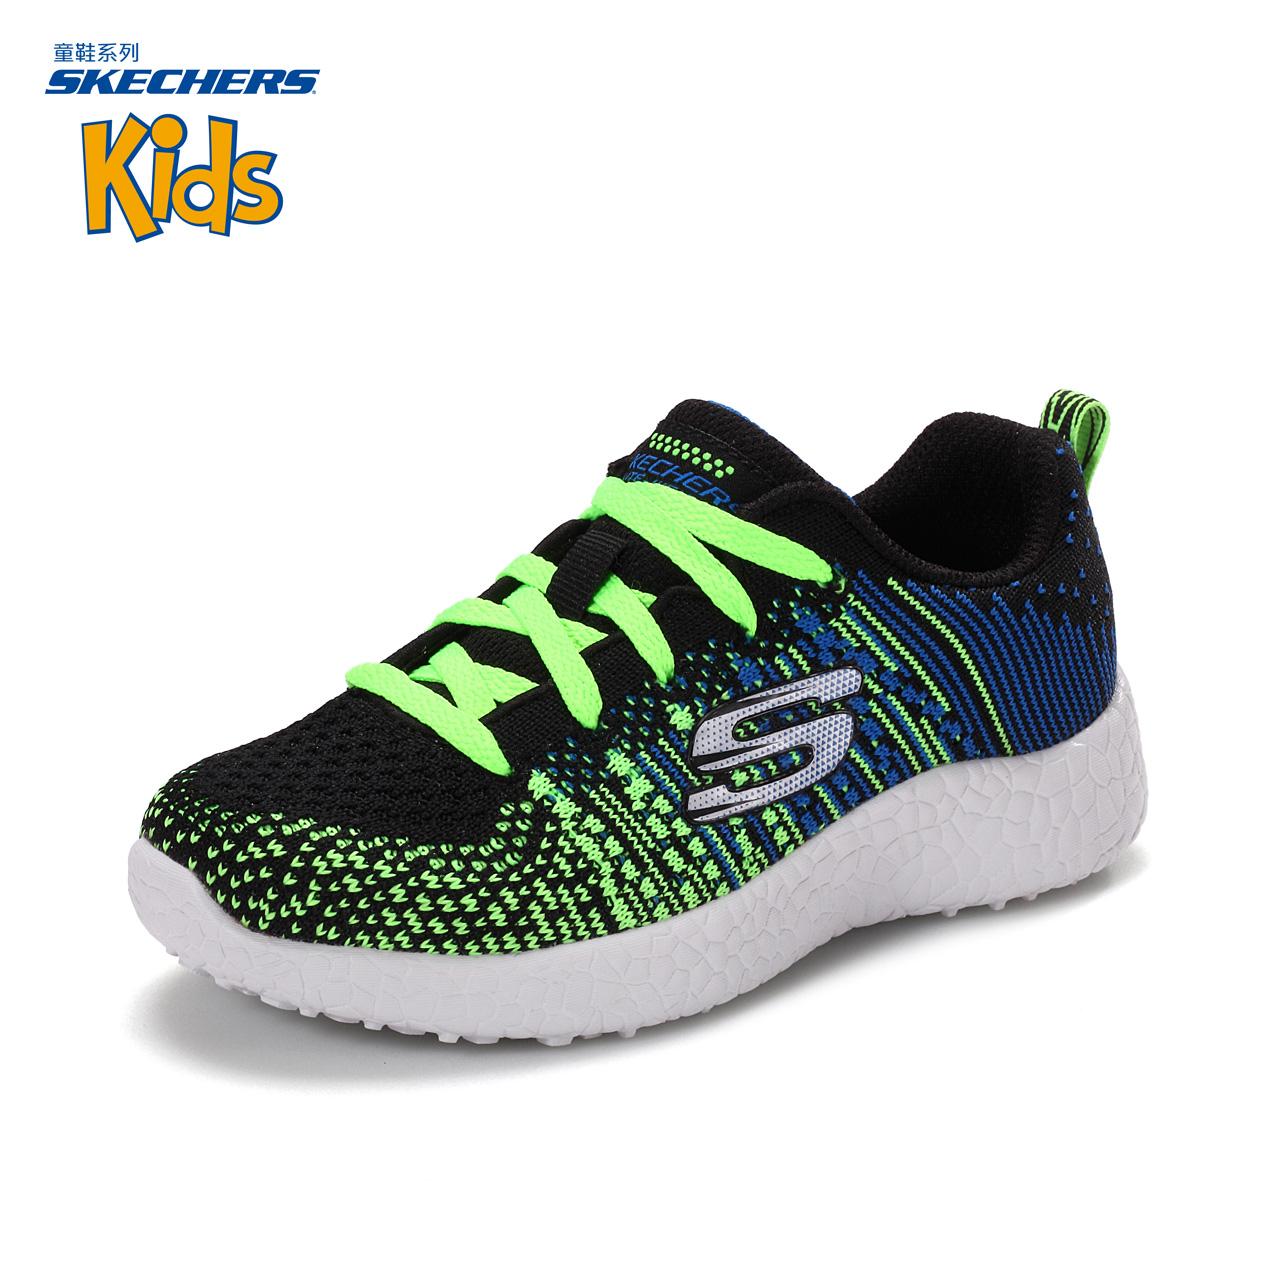 skechers shoes new design